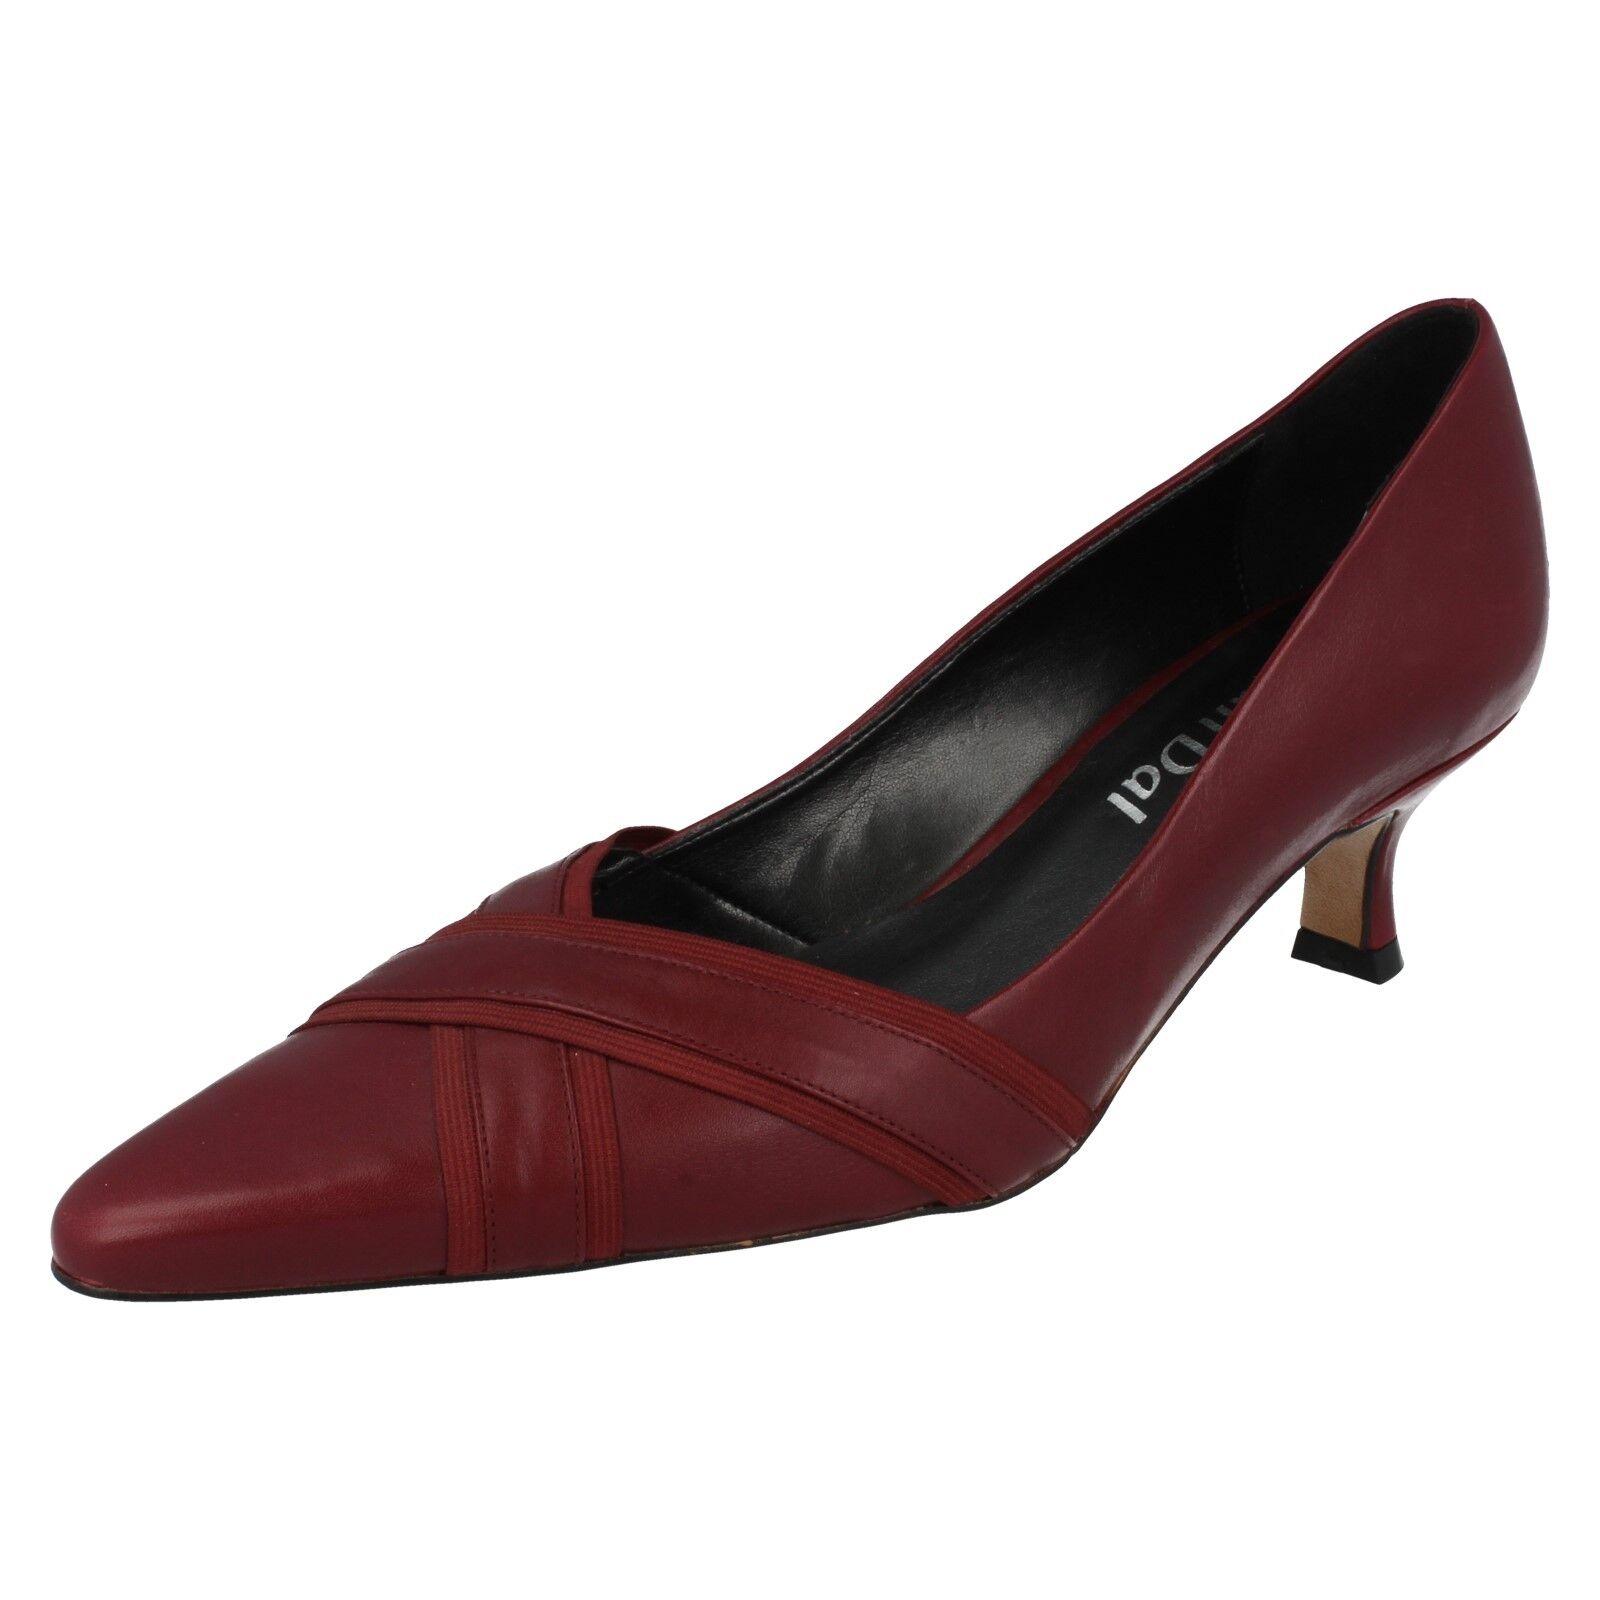 Señoras Borgoña Cuero Slip On Puntera en Punta Van Dal Zapatos Tribunal Zapatos Dal Pelle 5dac81